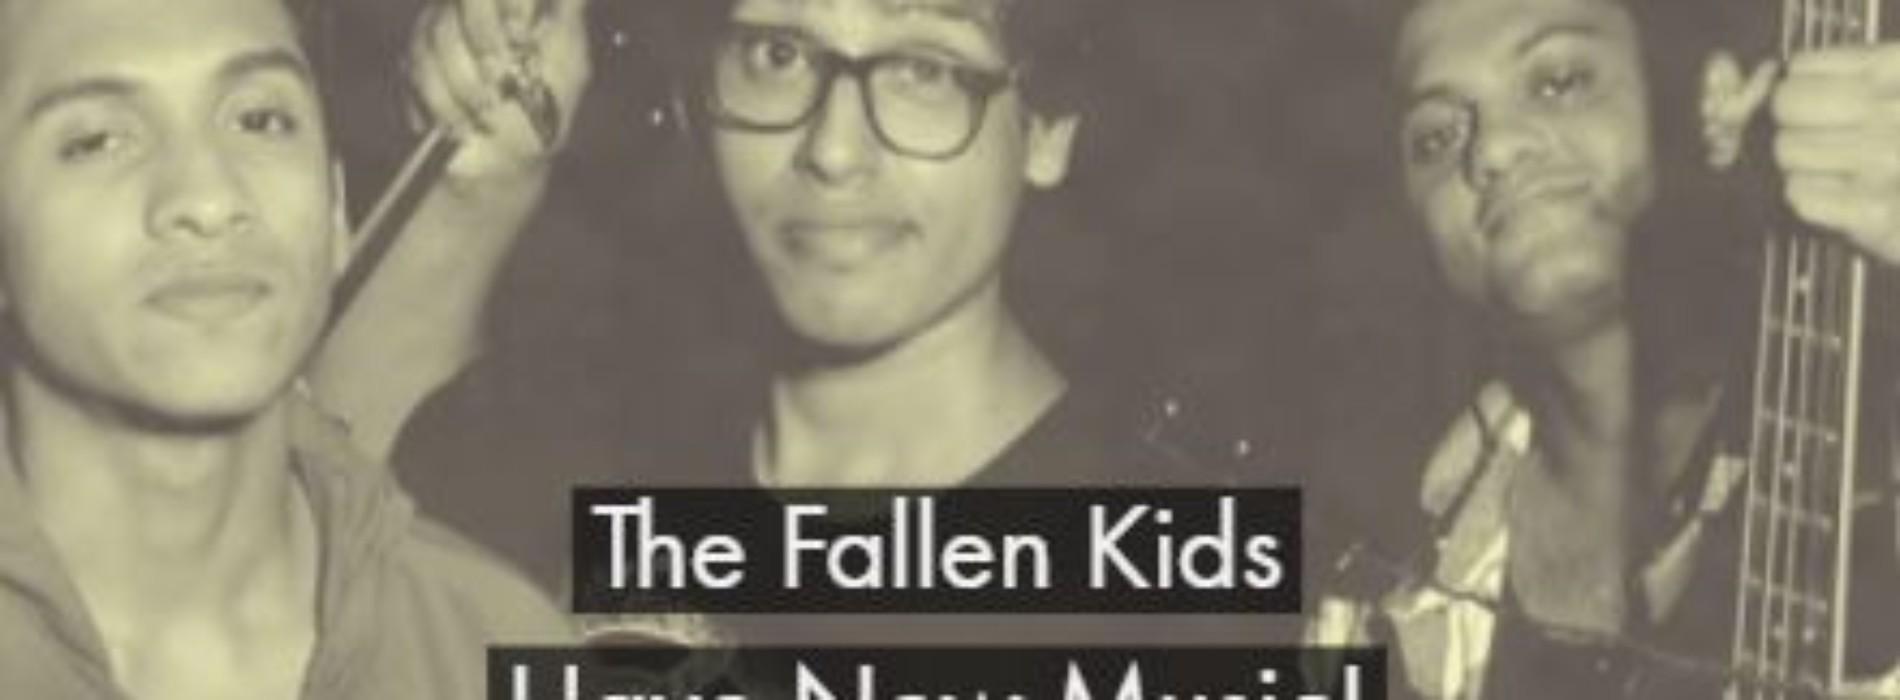 The Fallen Kids Release A New Video